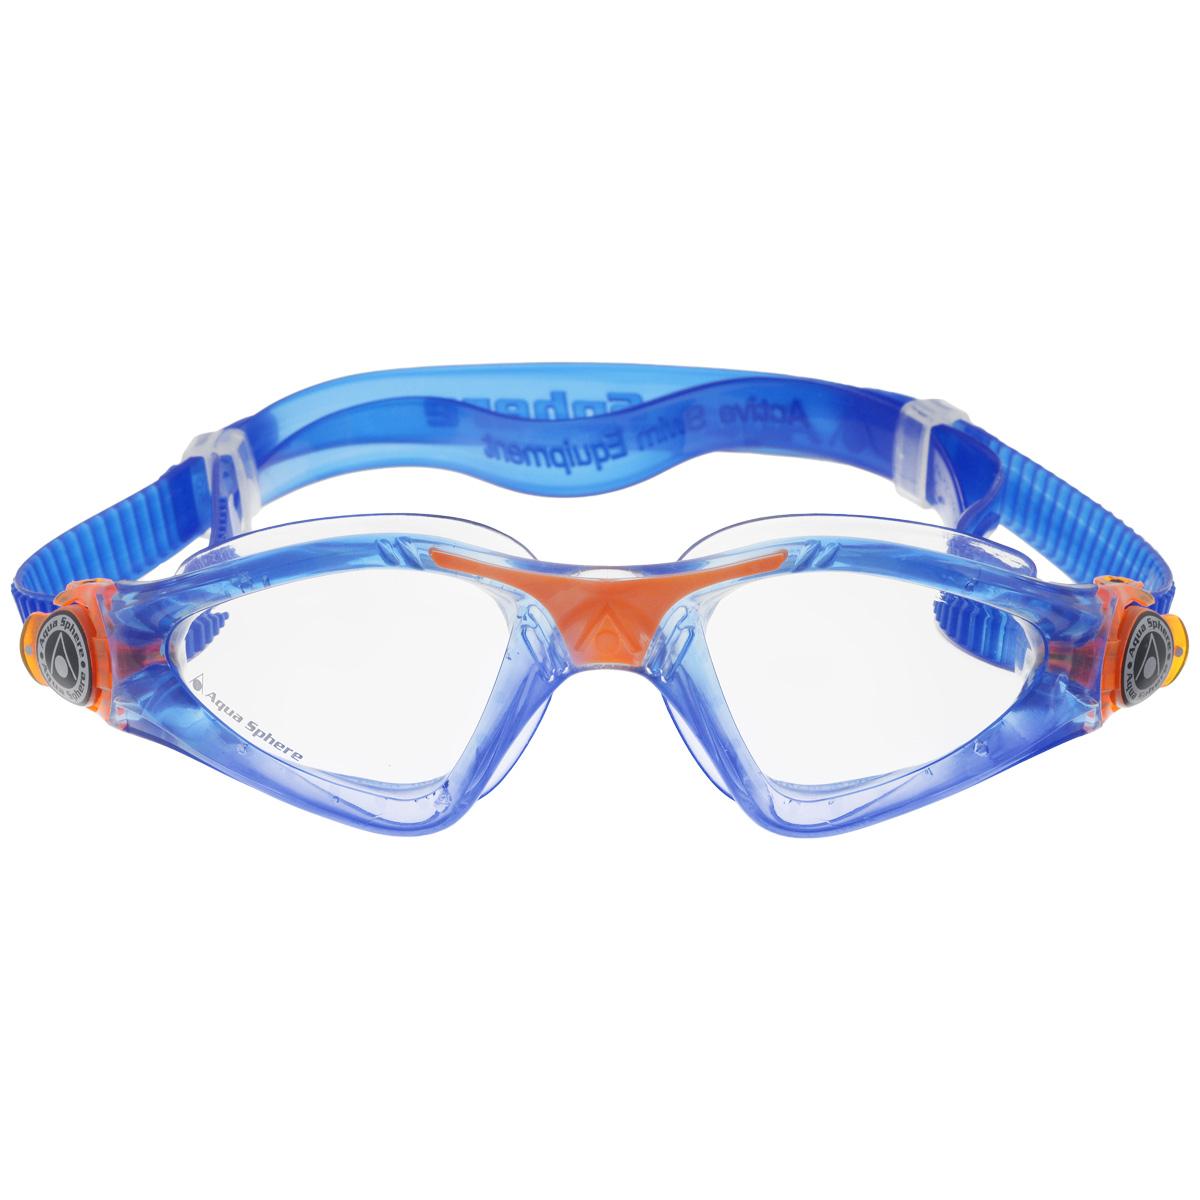 Очки для плавания Aqua Sphere Kayenne Junior, цвет: синий, оранжевый очки для плавания aqua sphere k180 lady цвет белый розовый